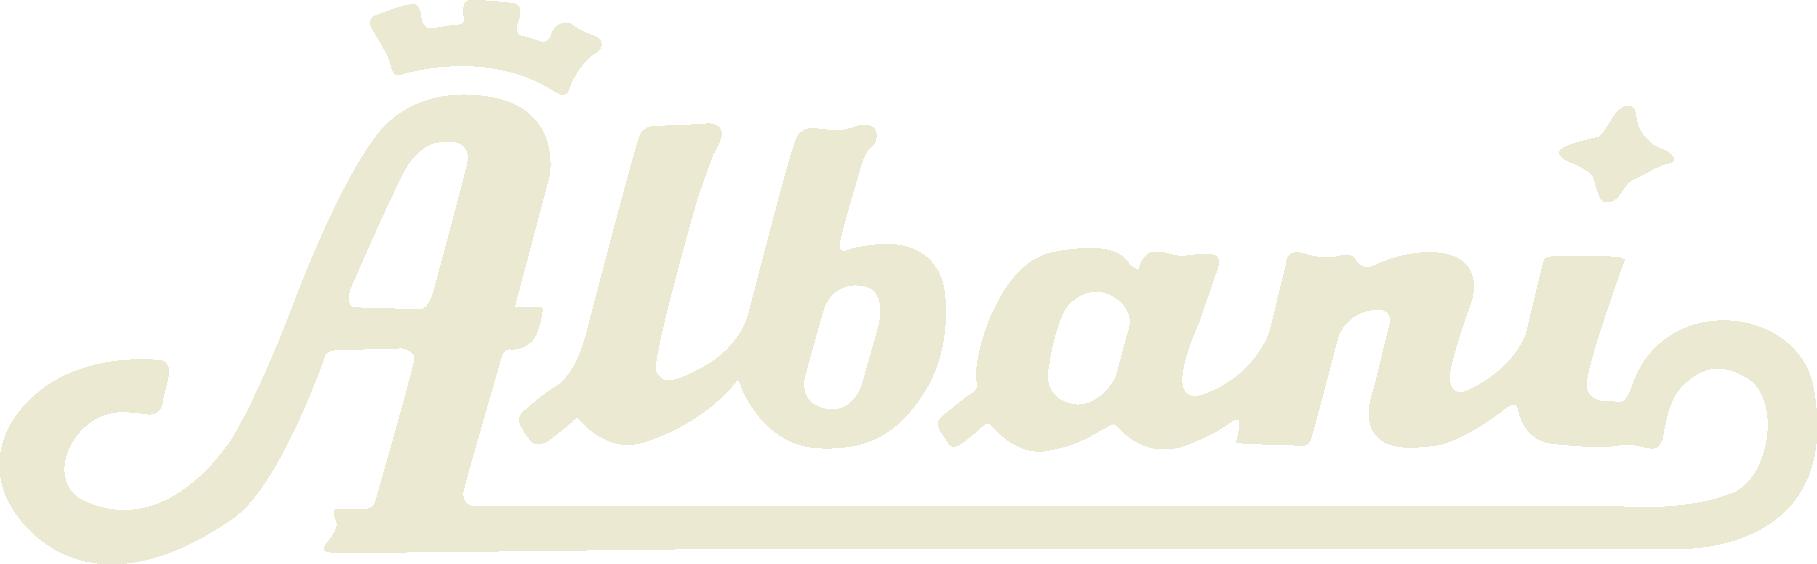 albanilogotext